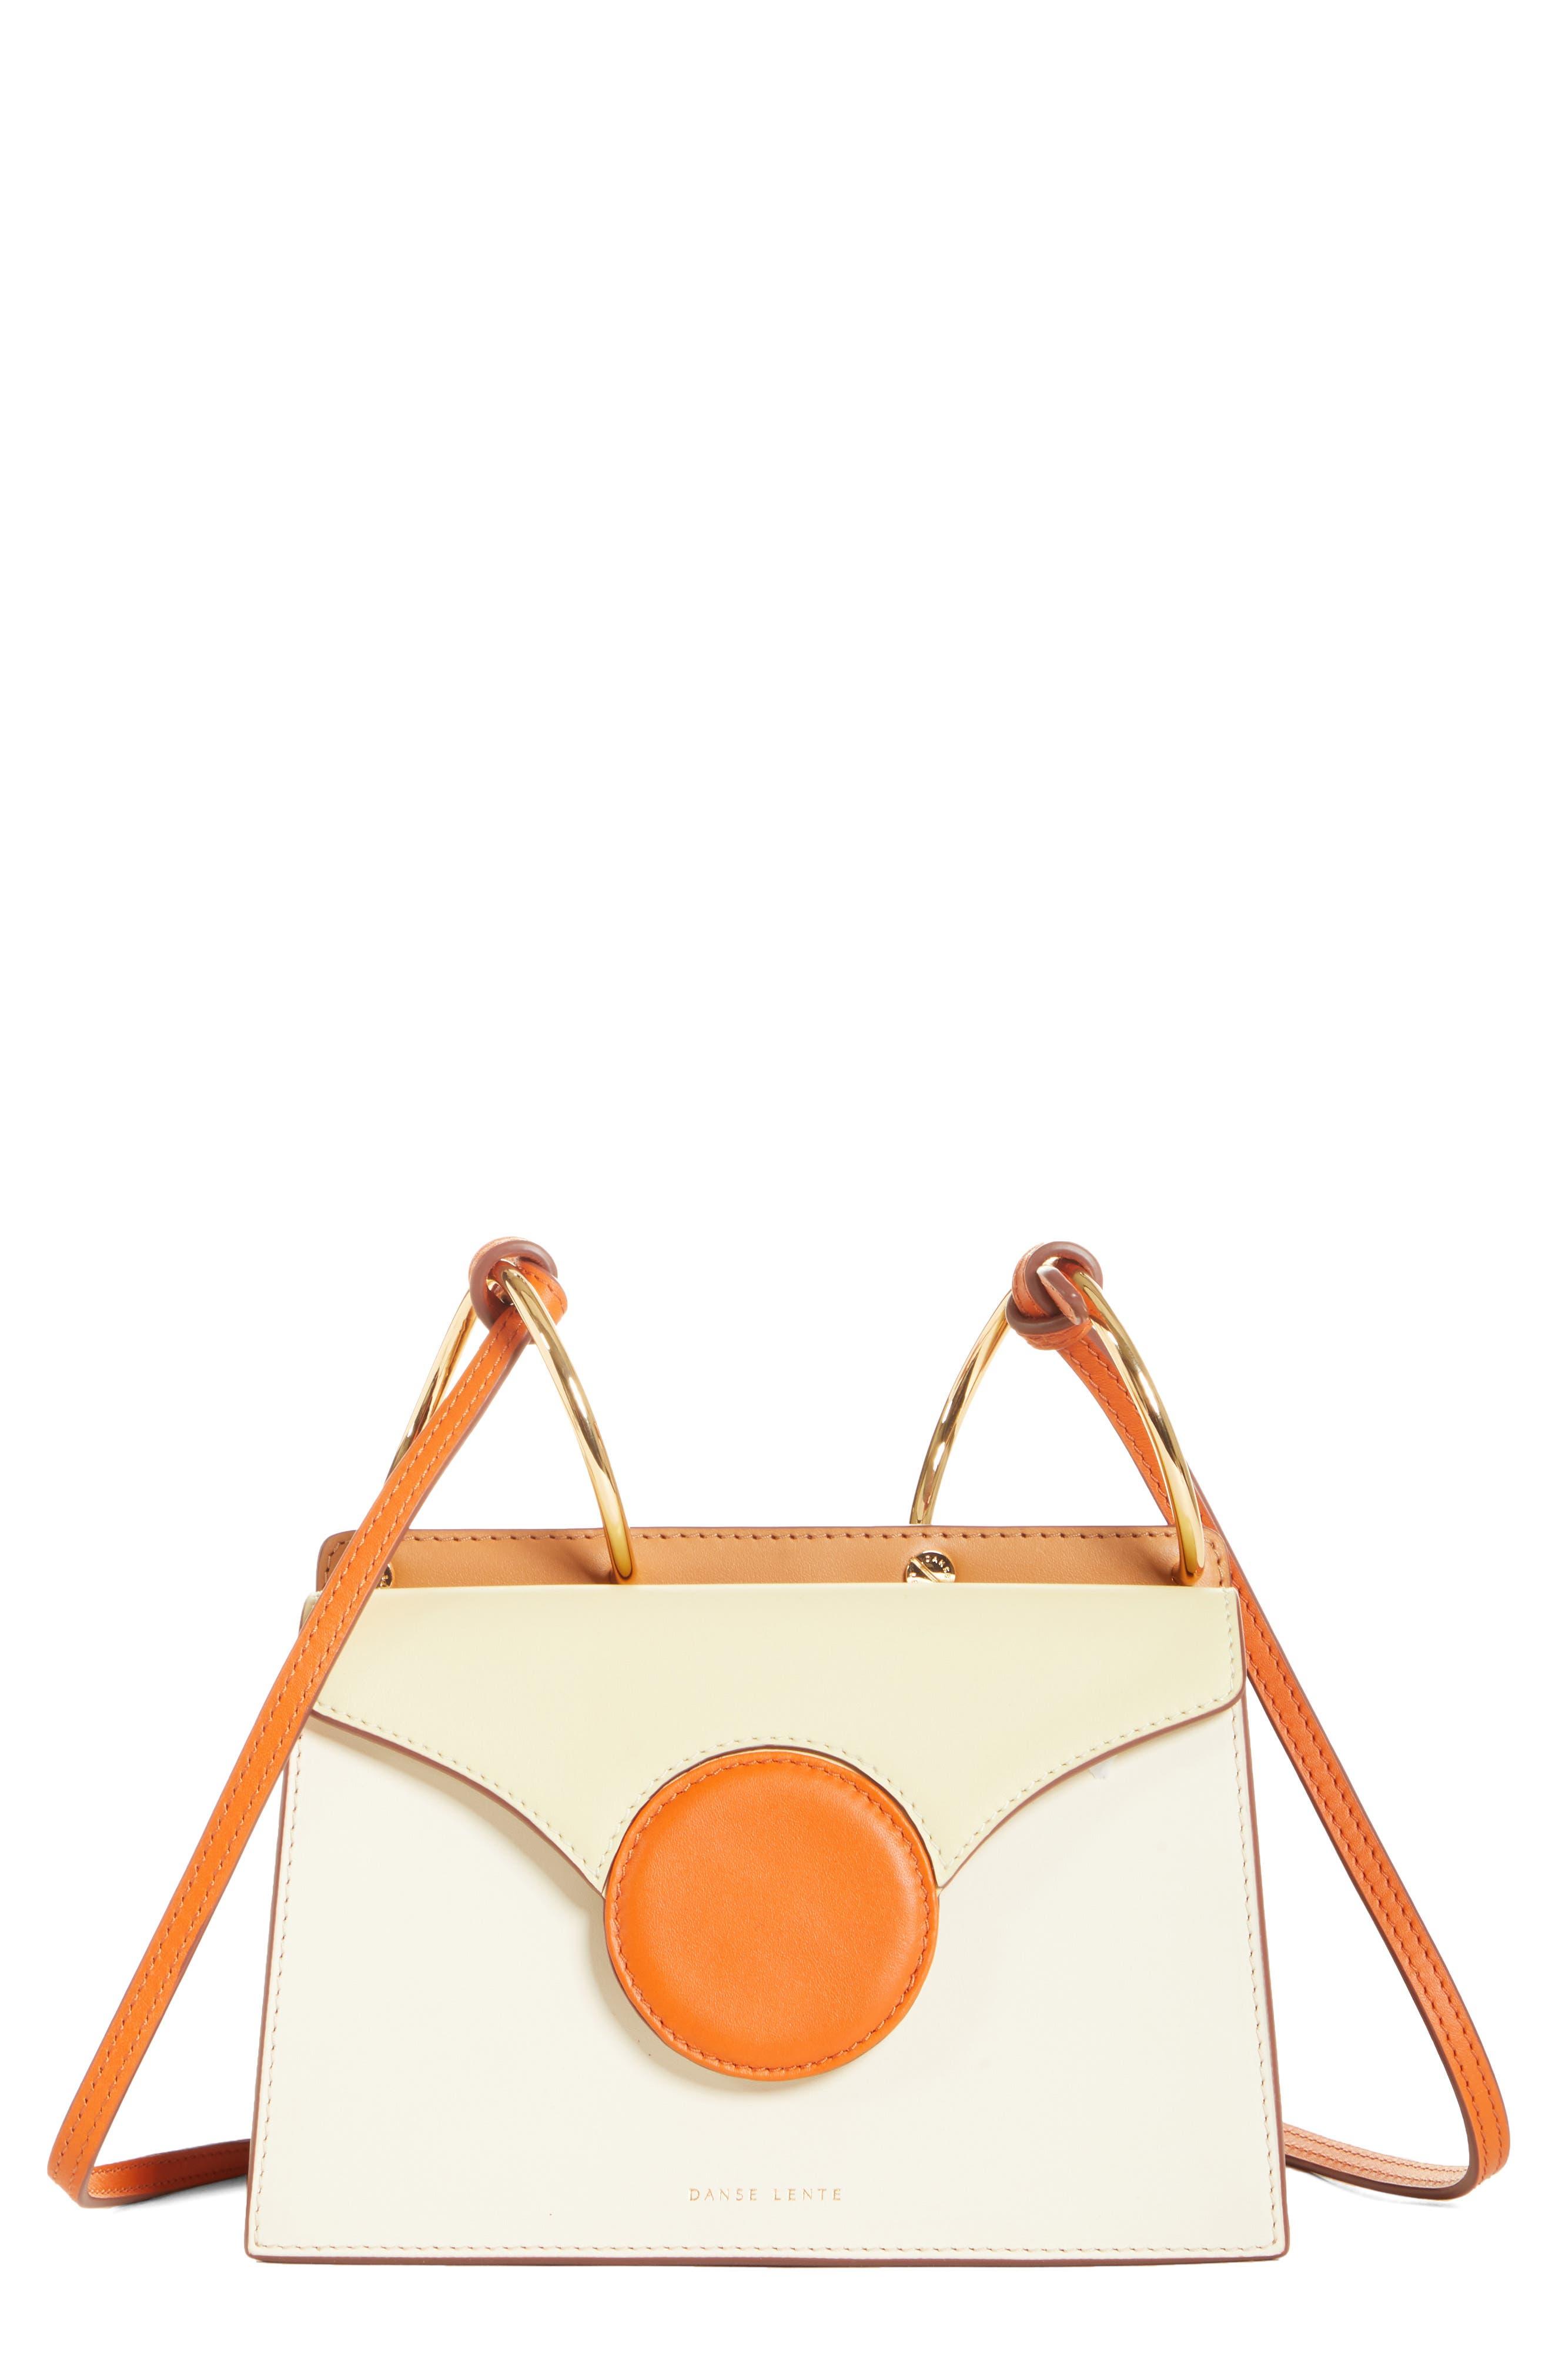 DANSE LENTE,                             Mini Phoebe Leather Bag,                             Main thumbnail 1, color,                             TOFFEE/ MARSHMALLOW